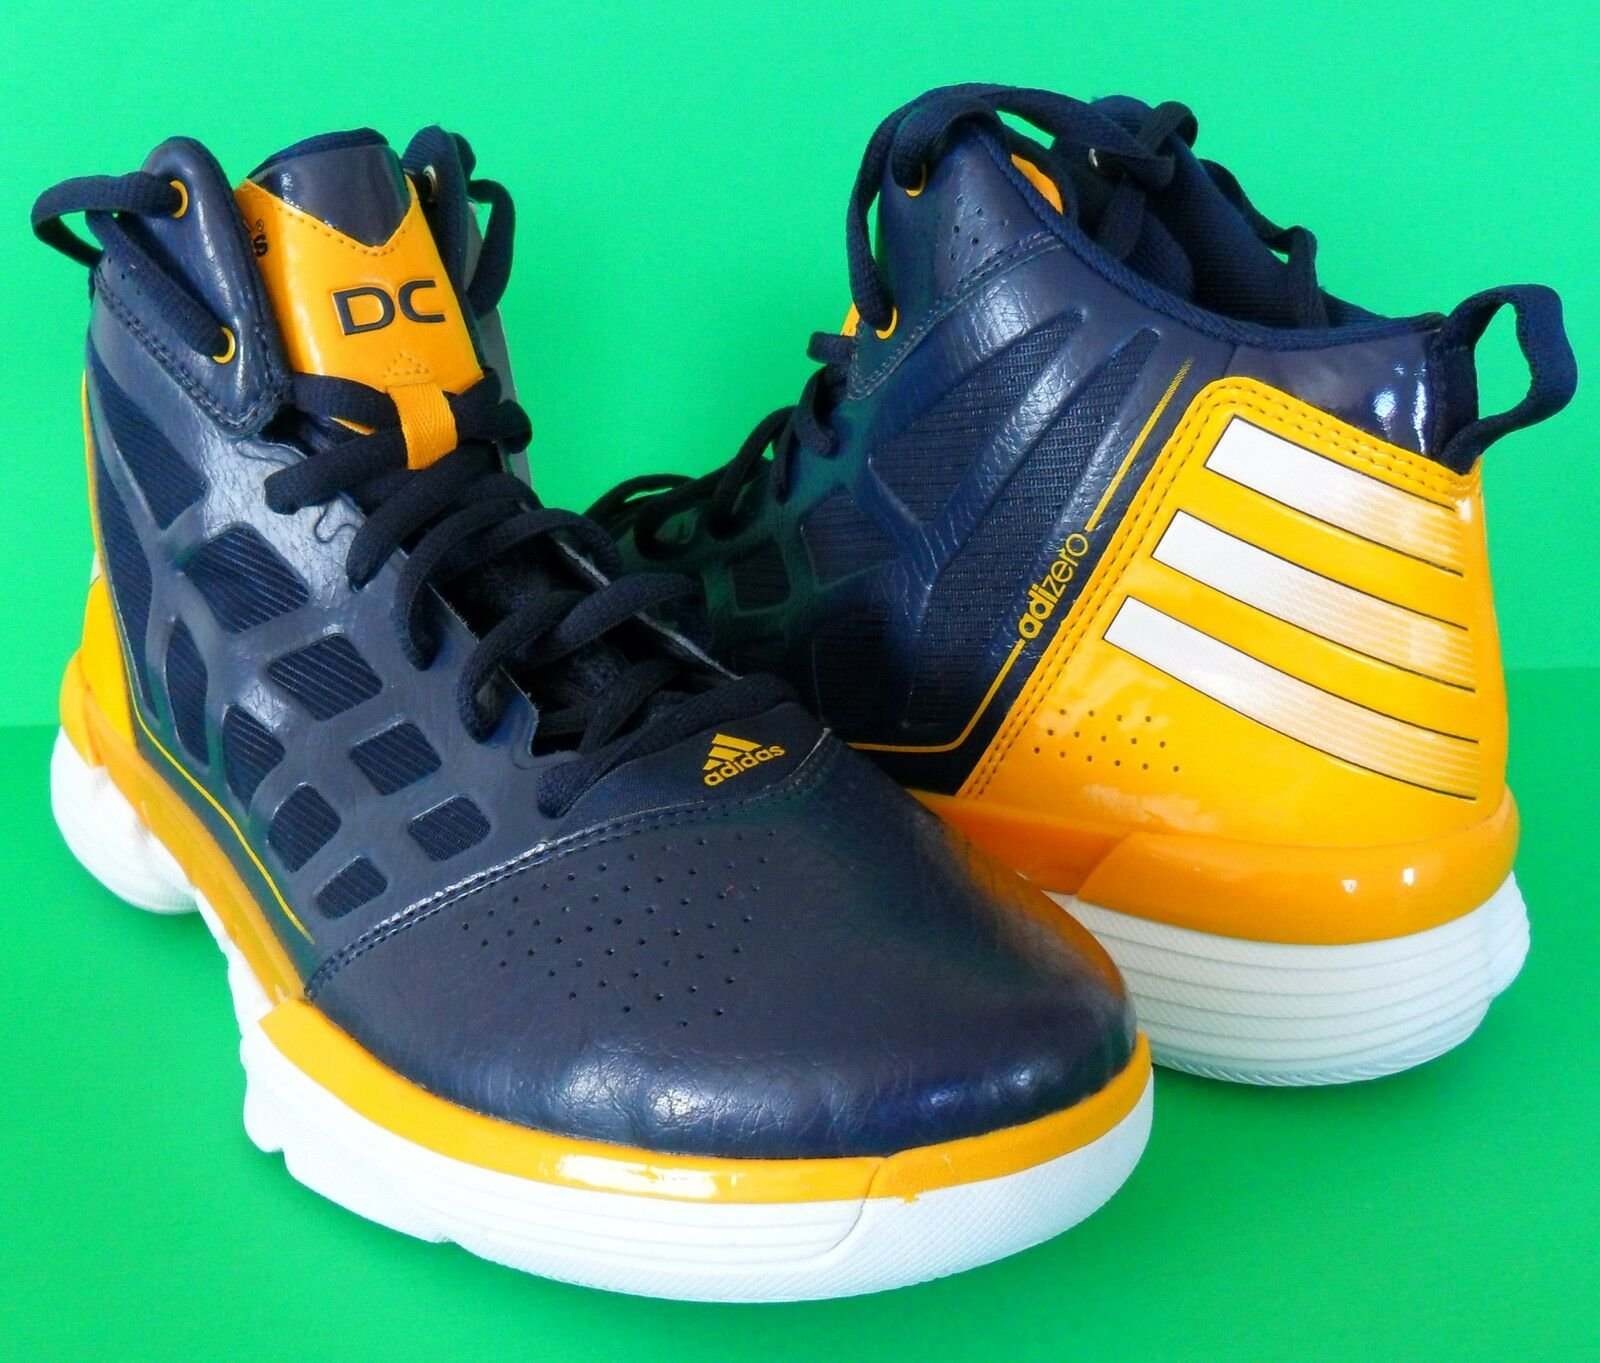 Limitata ed - adidas adizero darren collison pallacanestro scarpa - ombra dc pallacanestro collison Uomo sz 11,5 6ce123